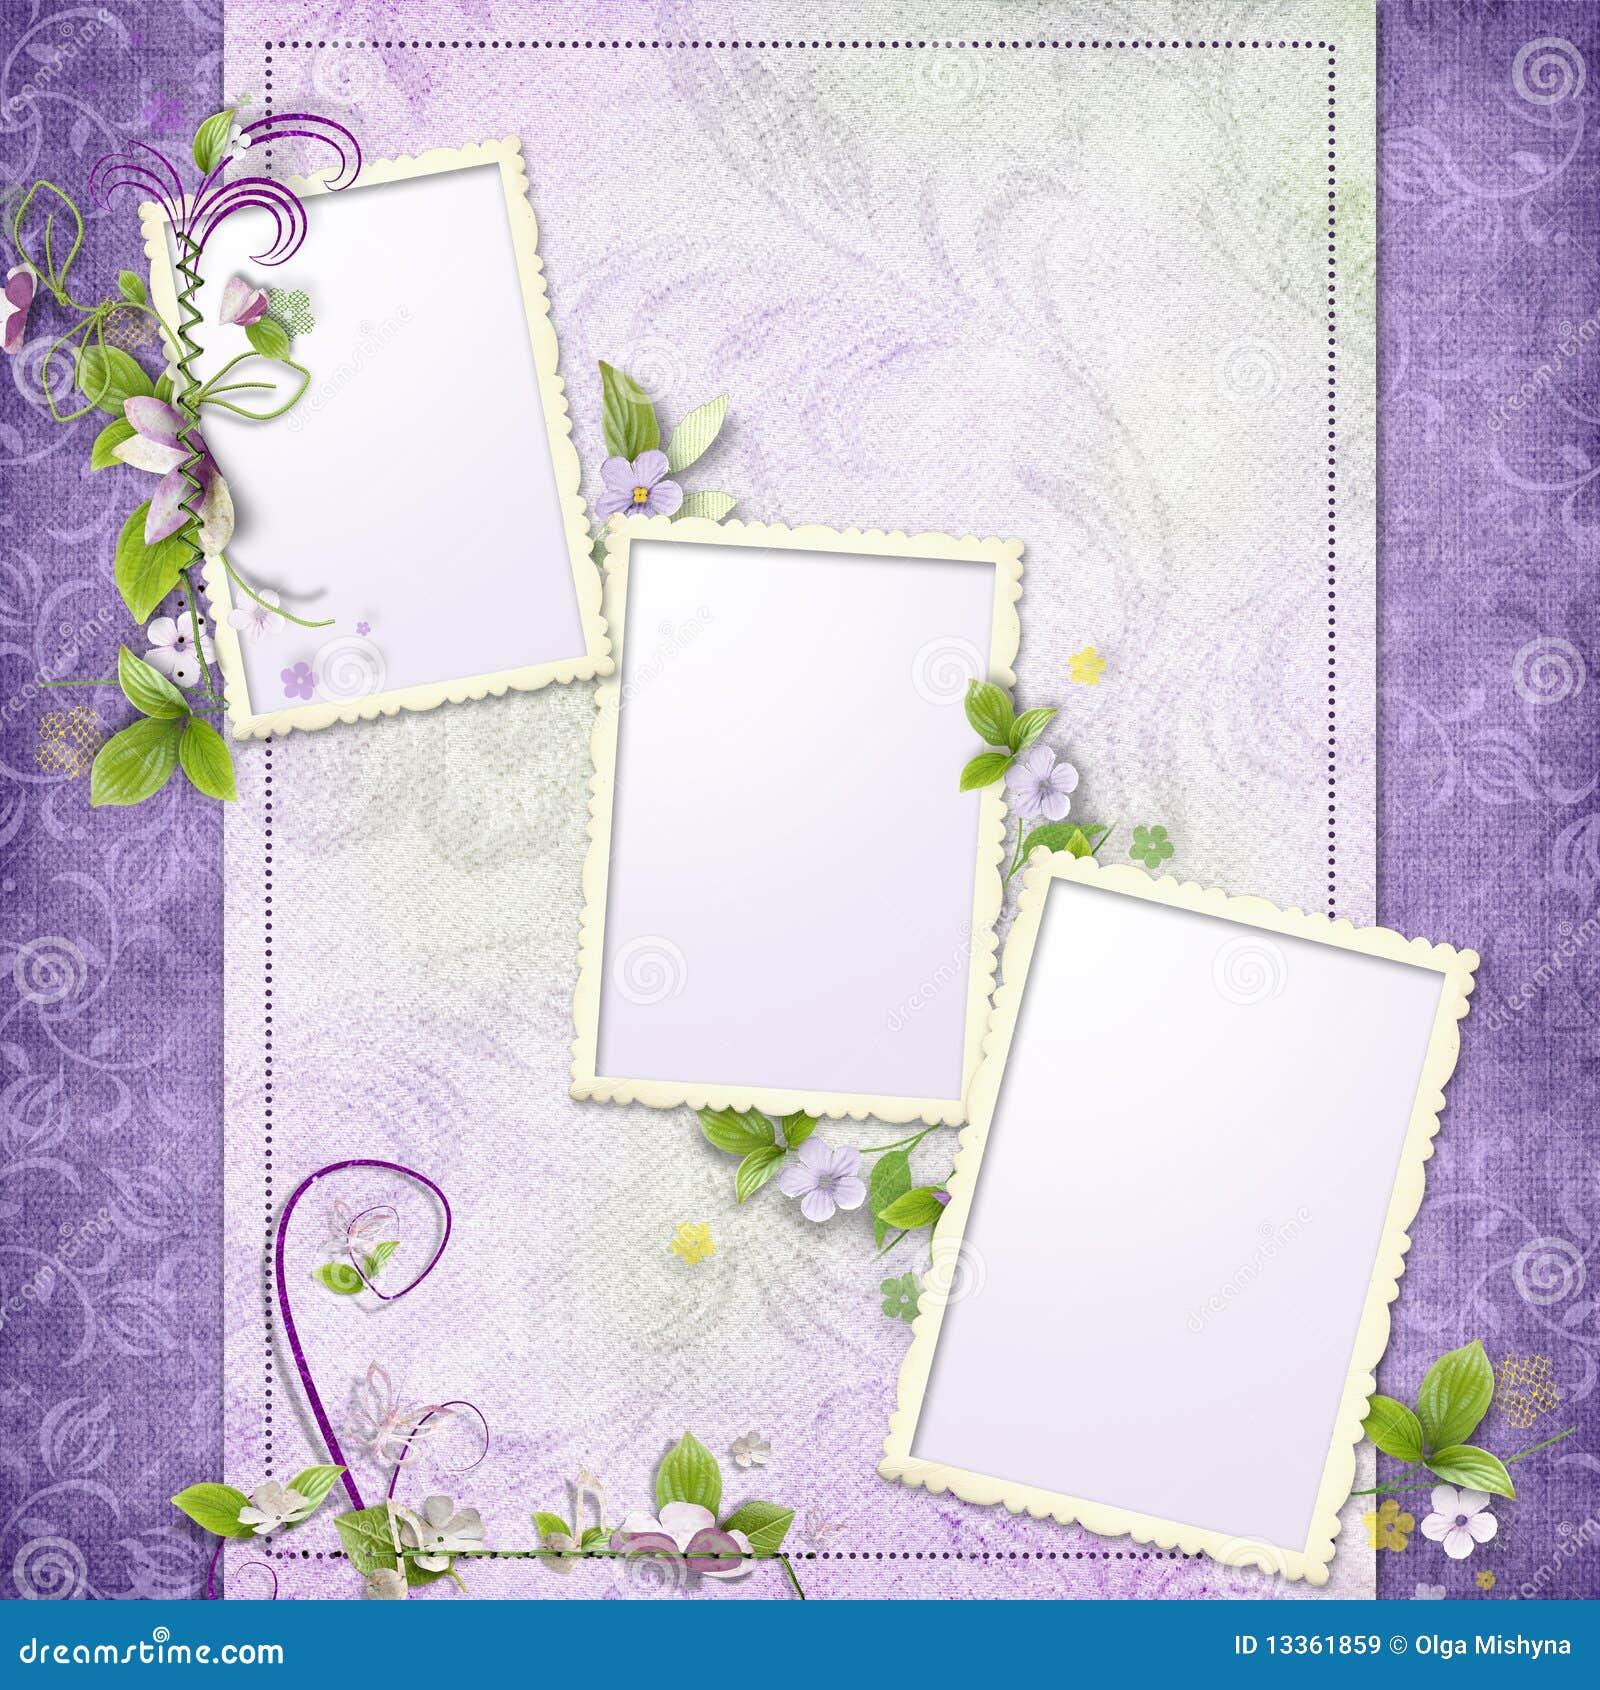 Marco Púrpura Para Tres Fotos Imagen de archivo - Imagen de ...